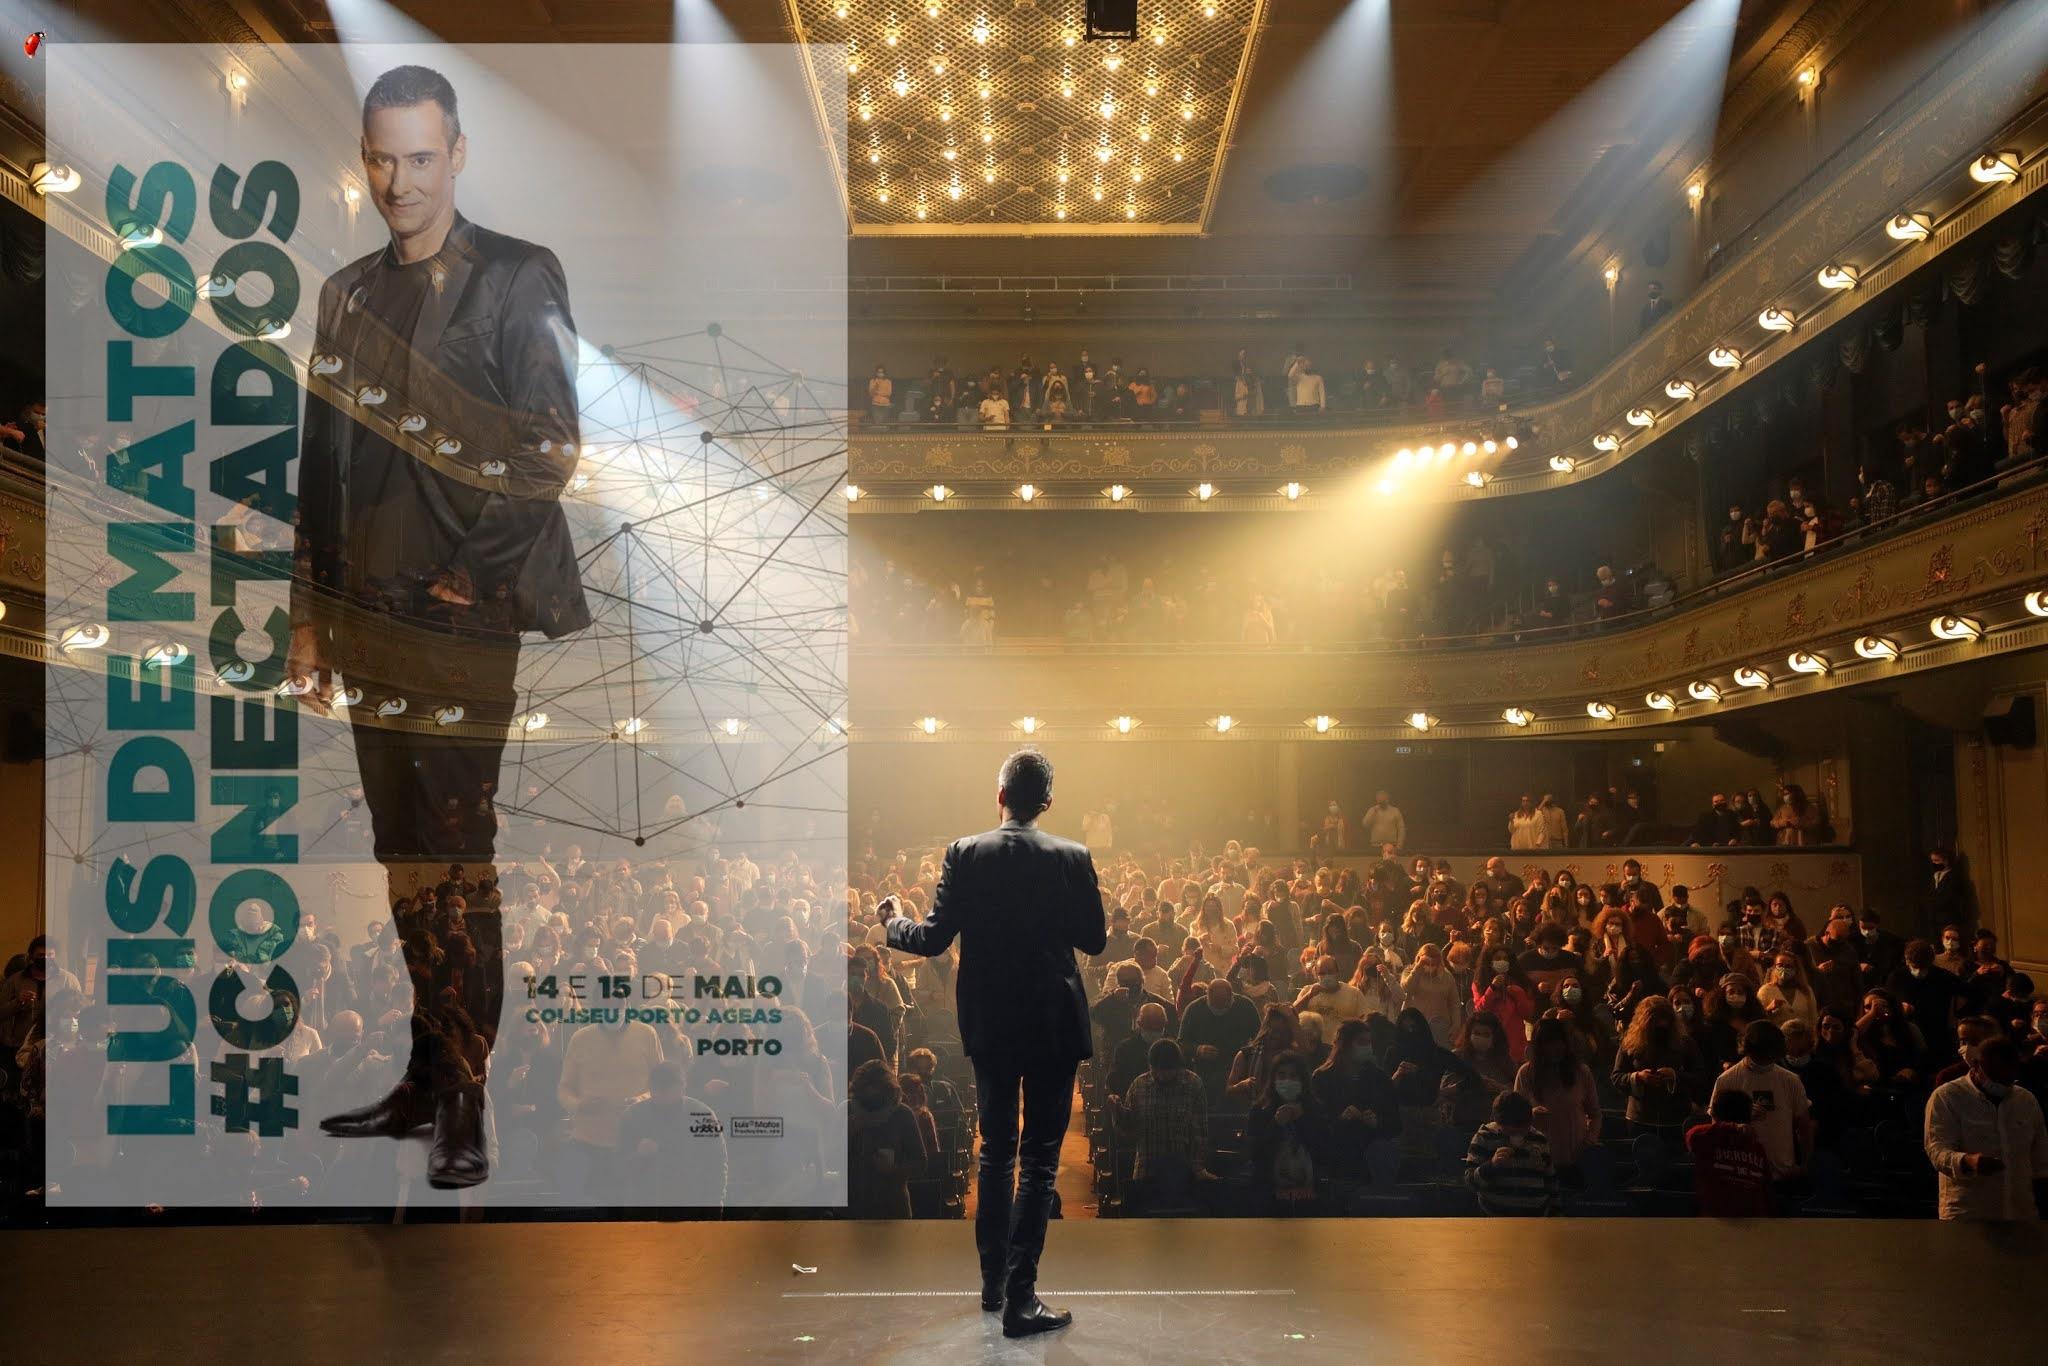 O espectáculo #Conectados de Luis de Matos que estreou no dia 18 de Dezembro de 2020 no Teatro Tivoli BBVA chega ao Coliseu Porto AGEAS nos dias 14 e 15 de Maio.